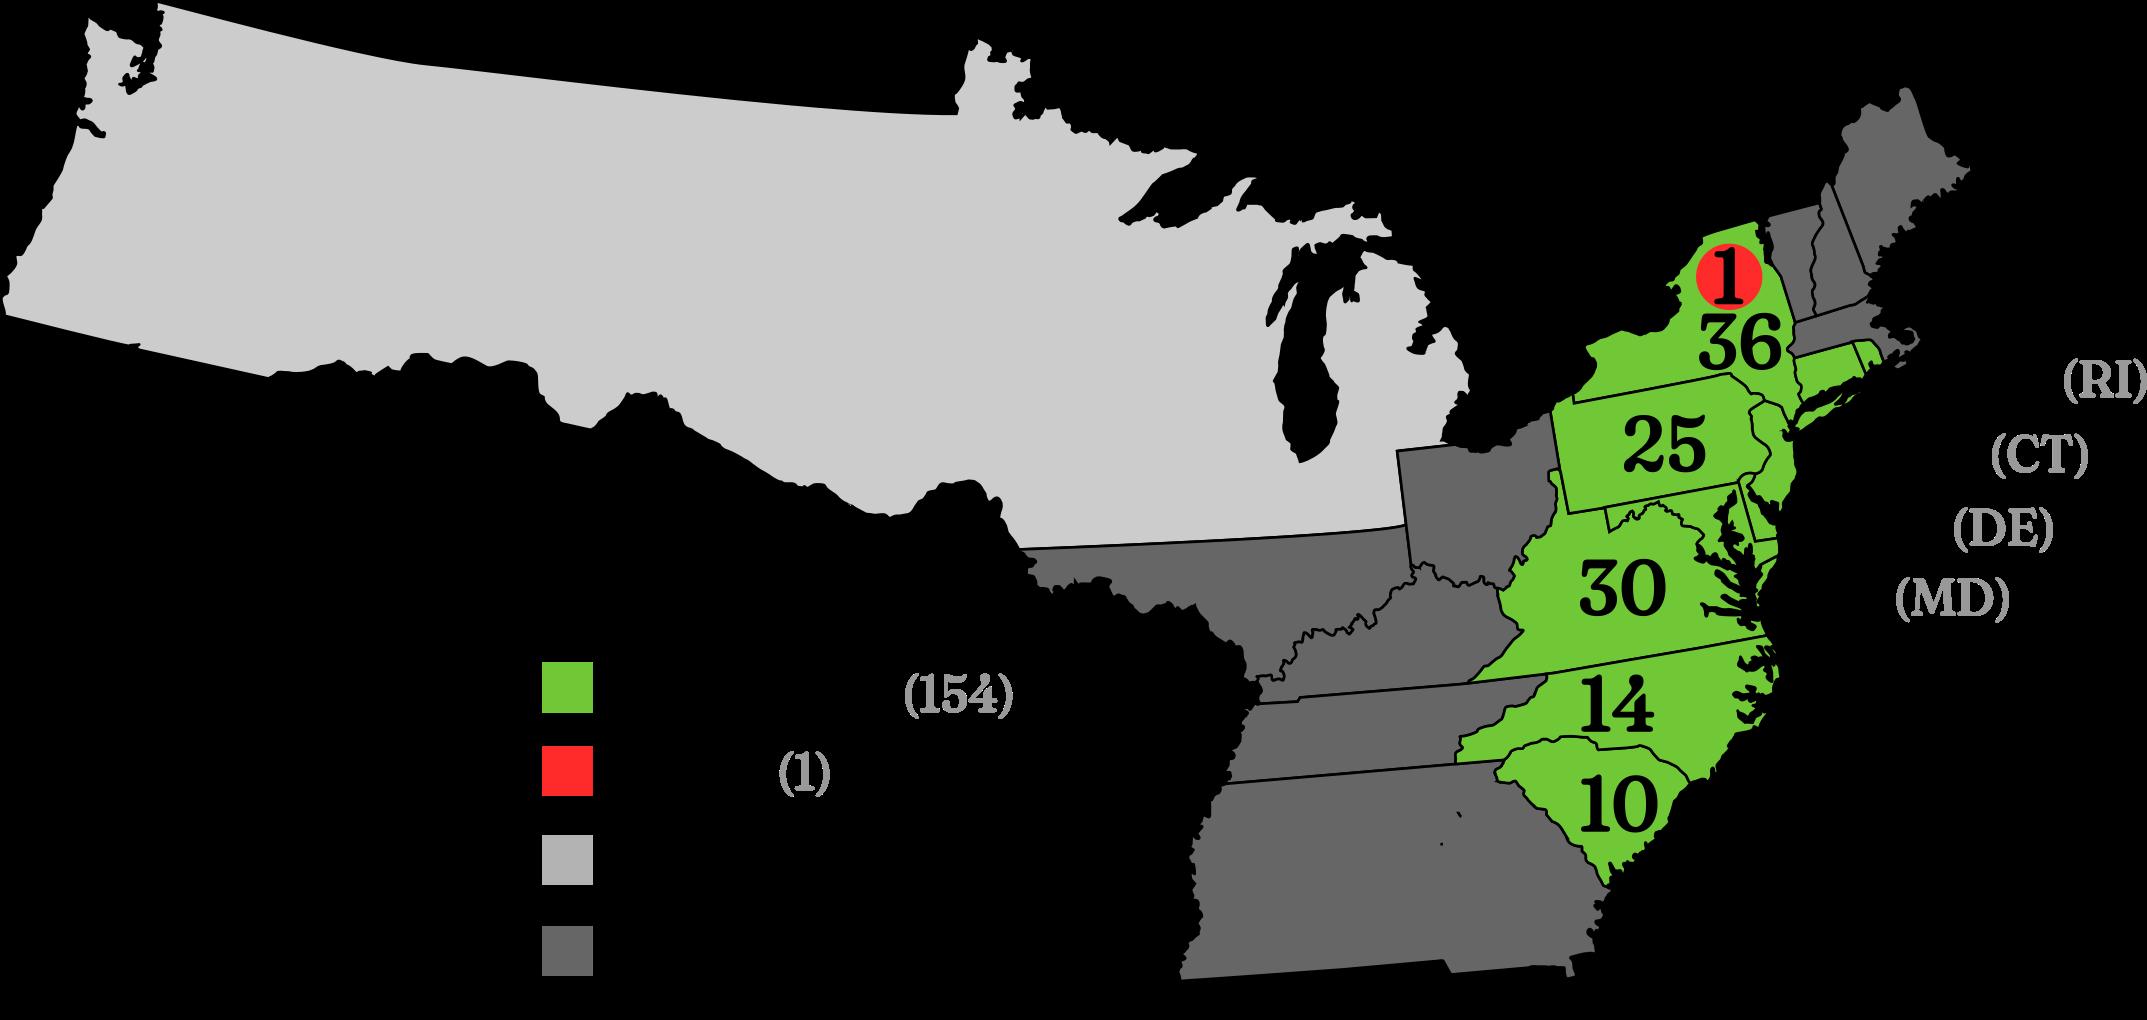 election-of-1812-iycki-png.629905